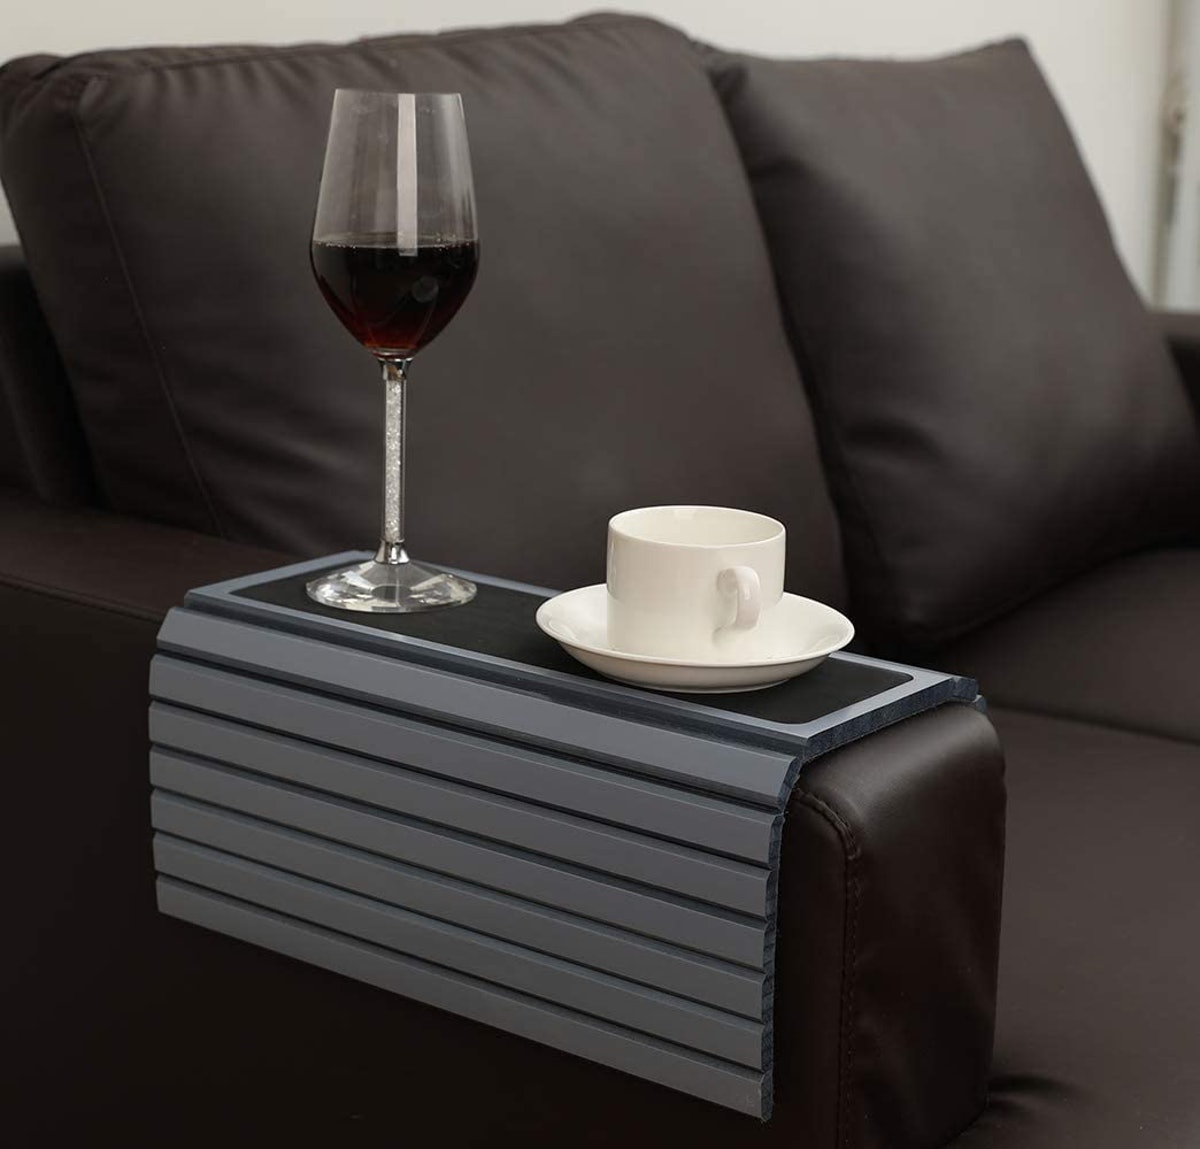 GEHE Sofa Arm Tray